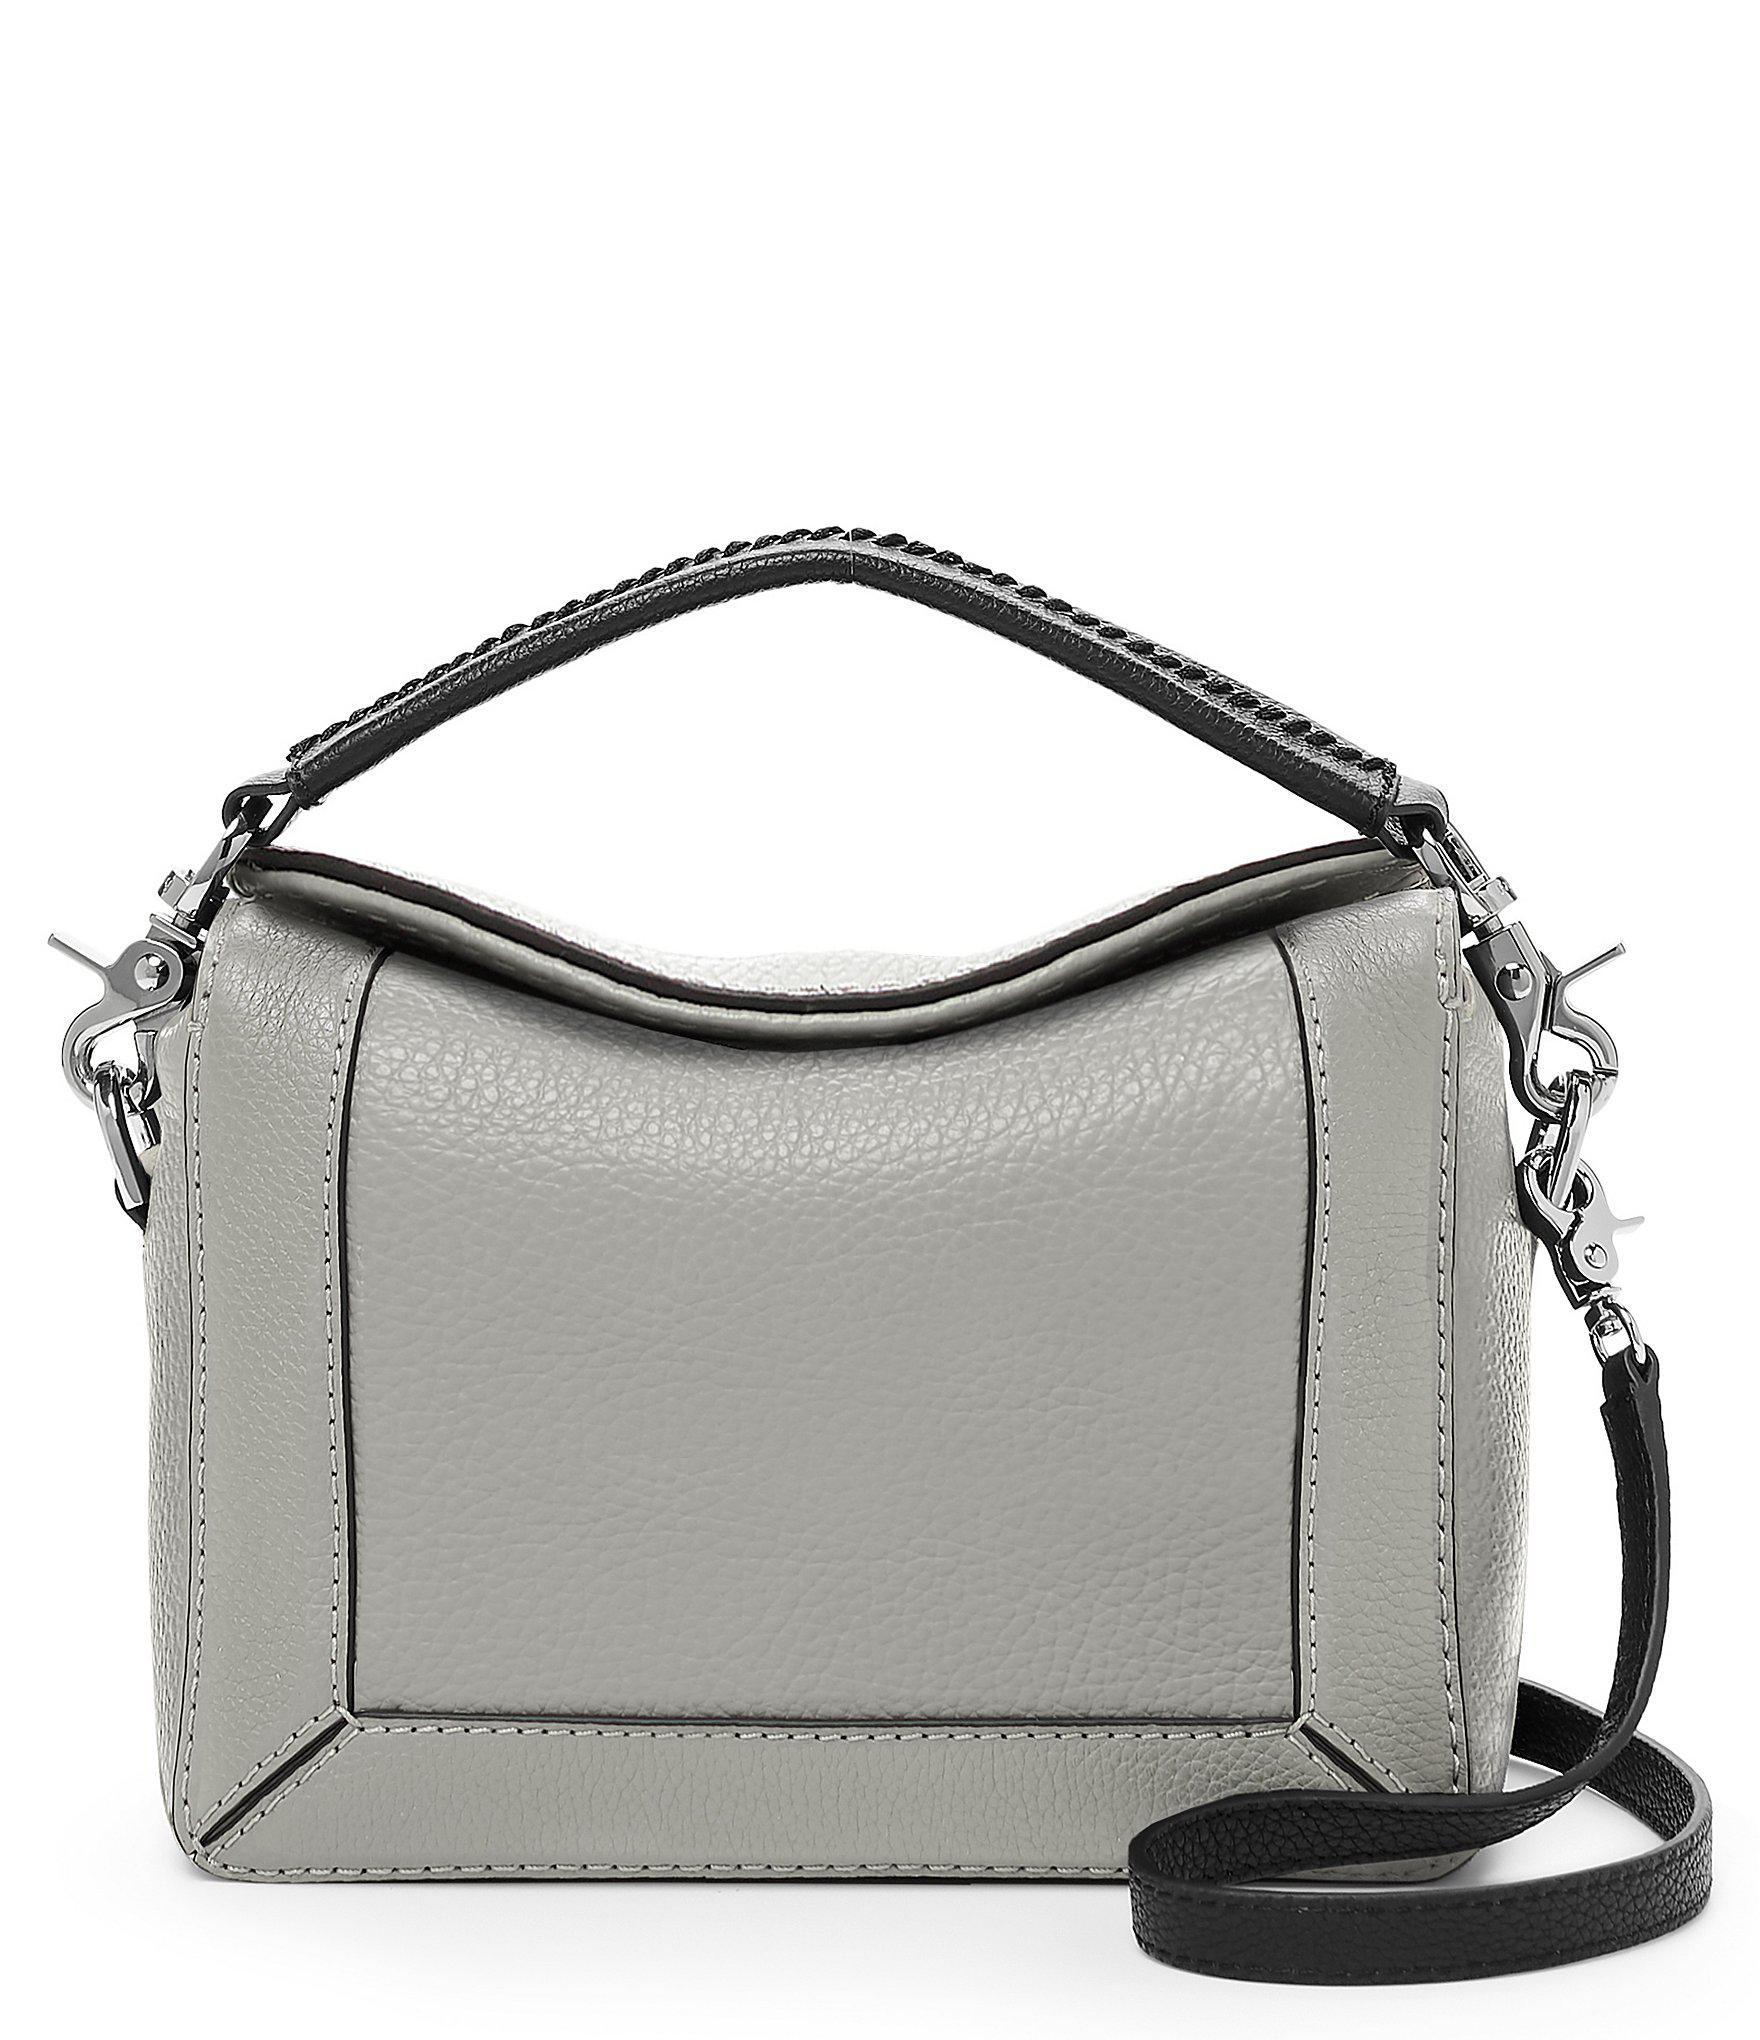 154079db666d9c Botkier Barrow Top-handle Cross-body Bag in Gray - Lyst